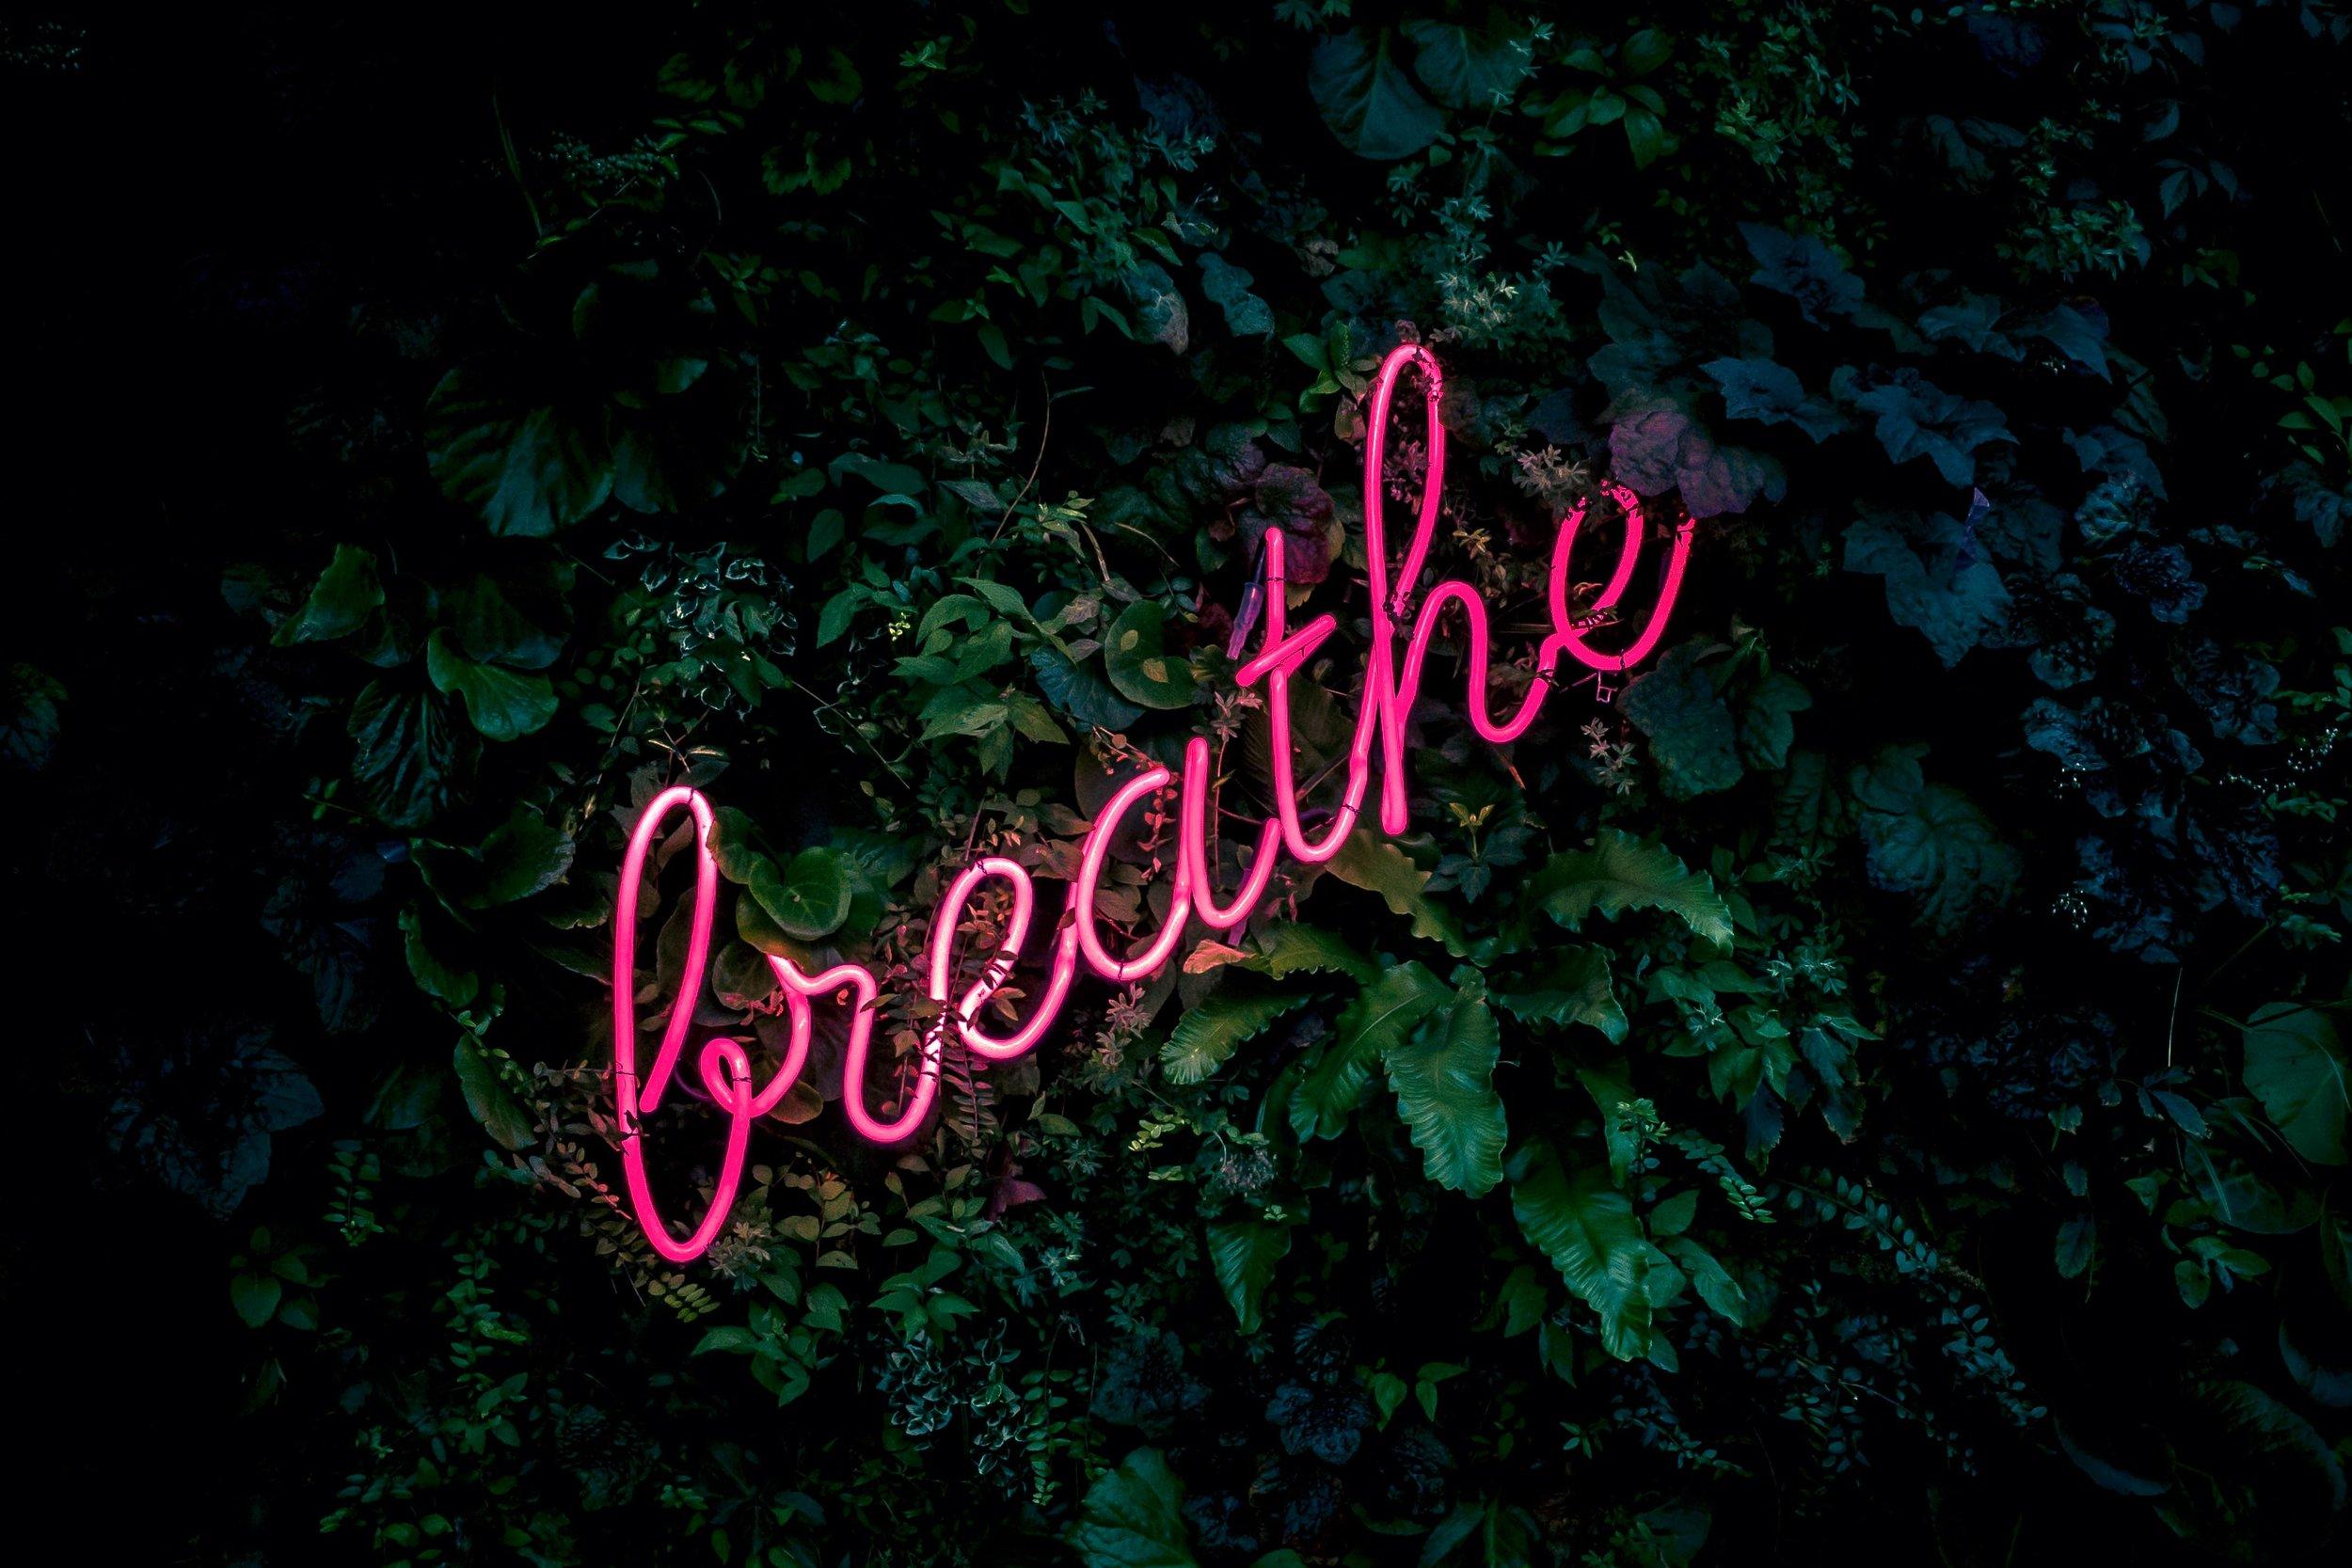 Breathe, Amsterdam. Photo by  Fabian Møller  on  Unsplash